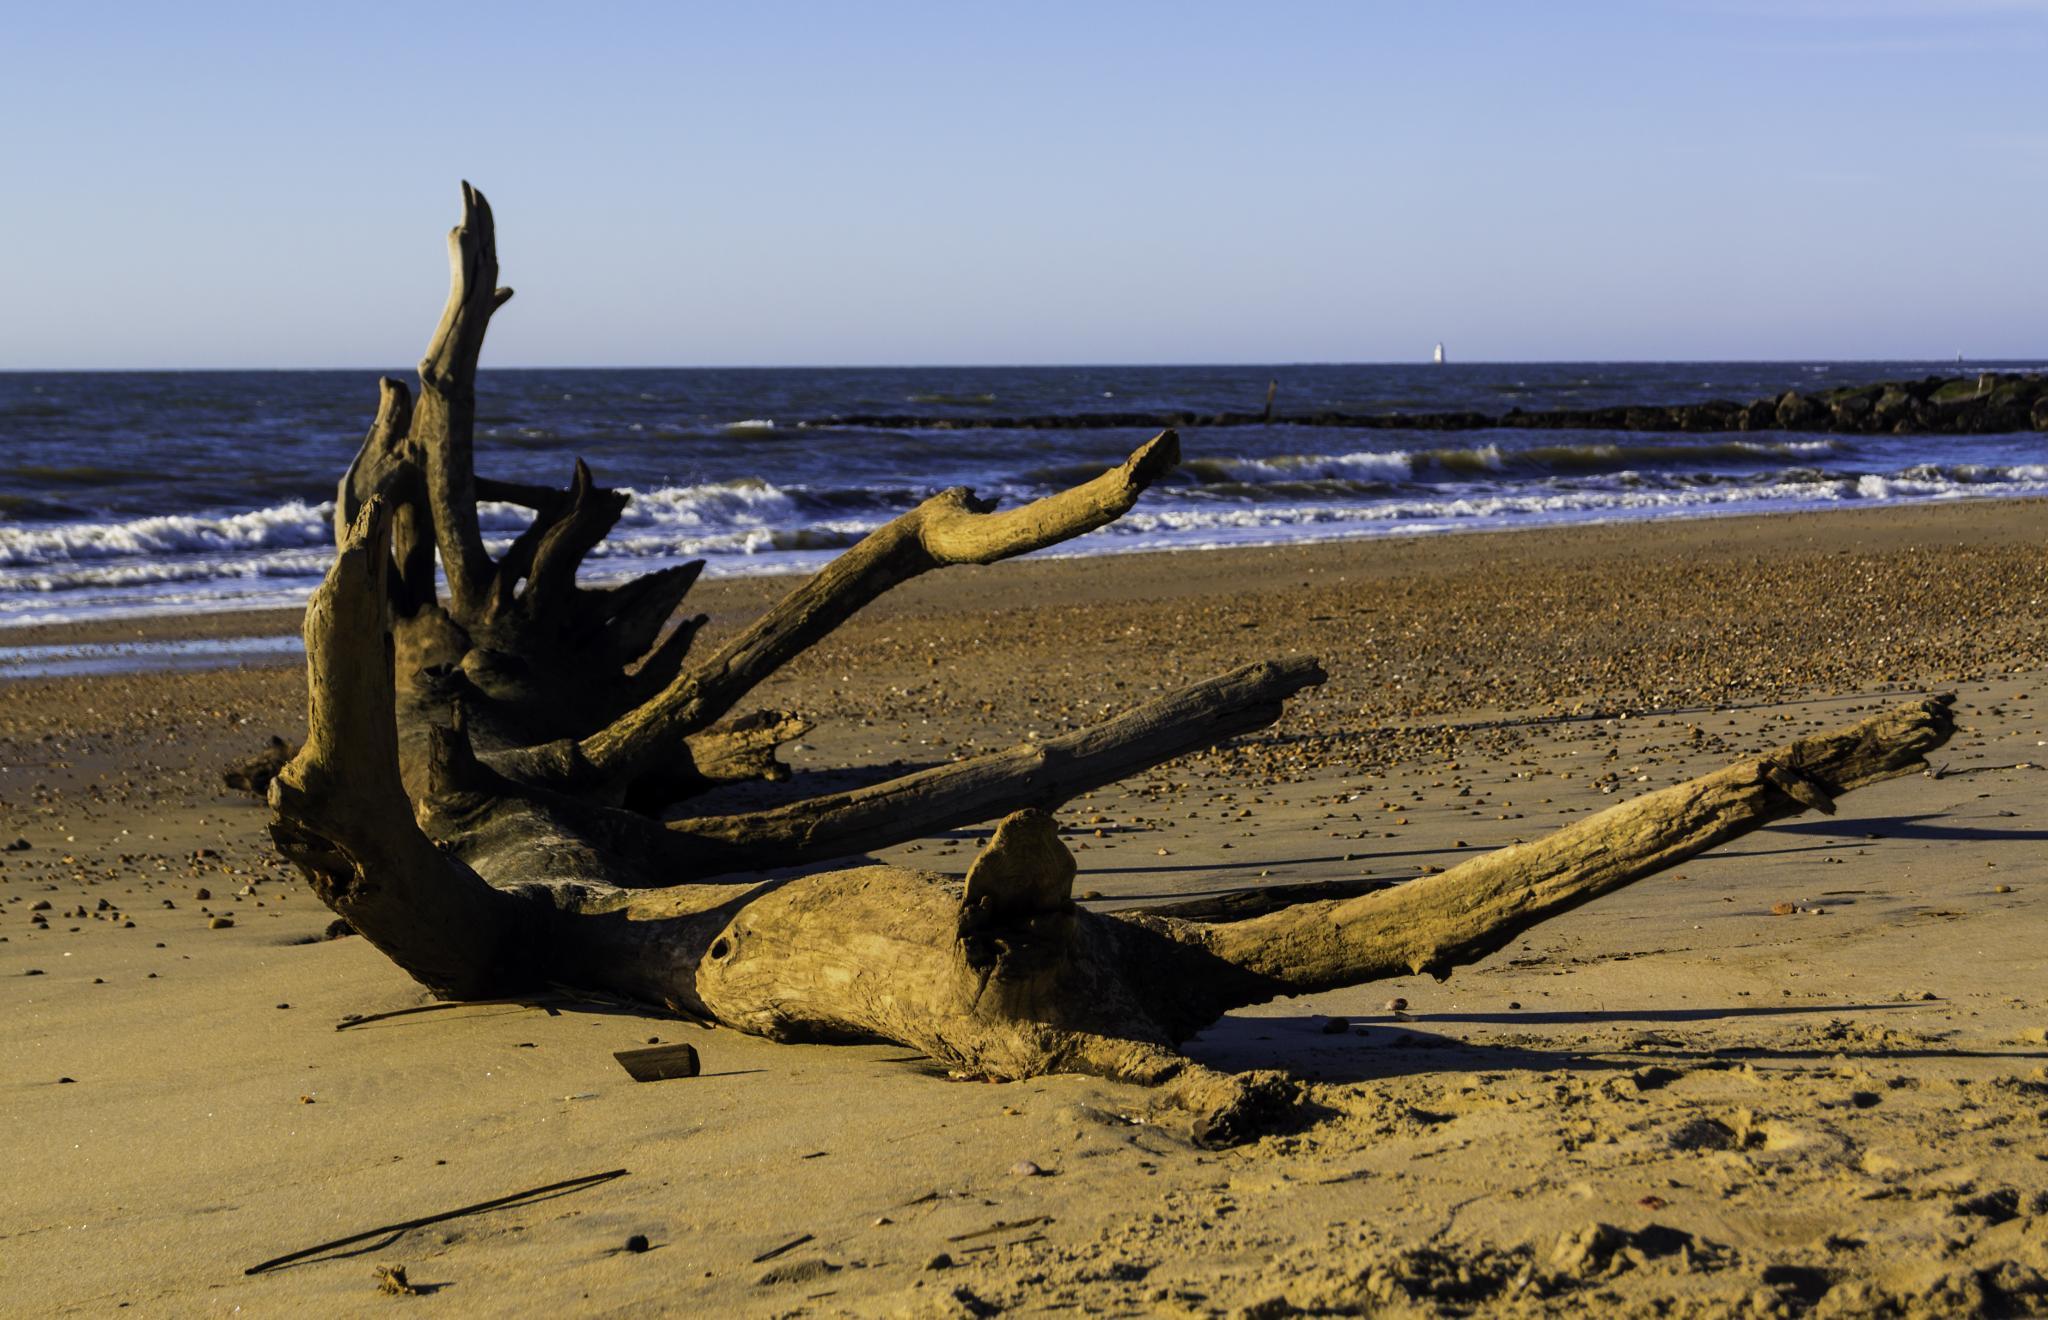 On The Beach v2 by JoeGeraci